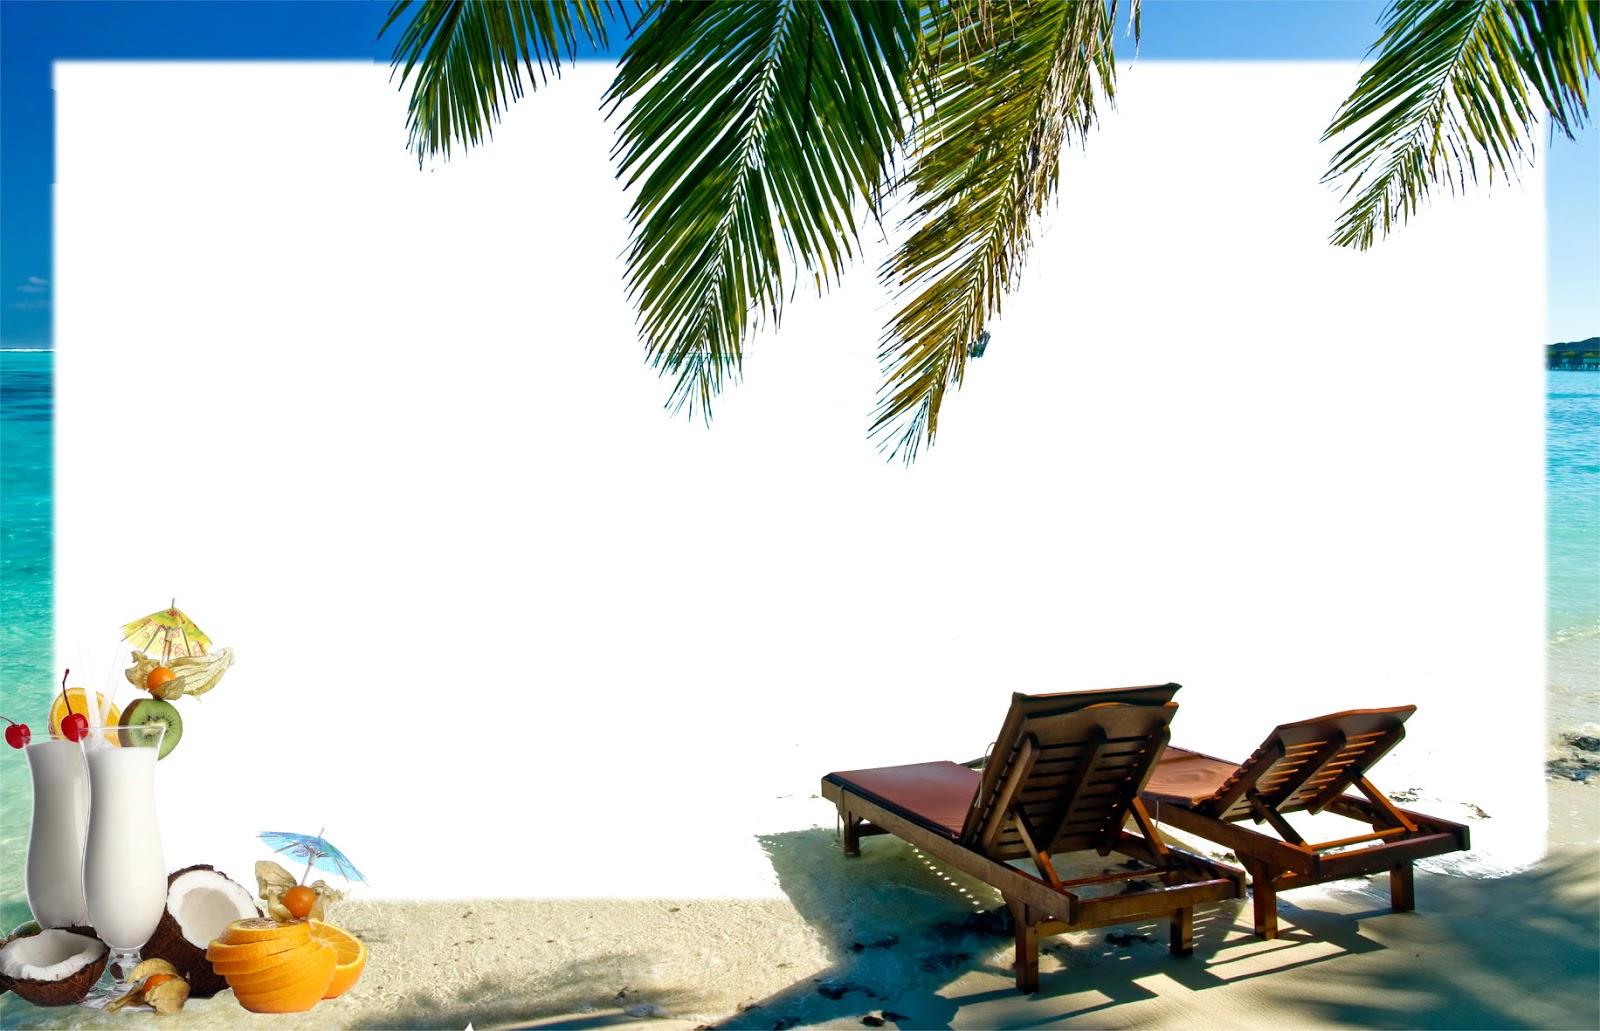 Картинки для слайдов в презентации отпуск